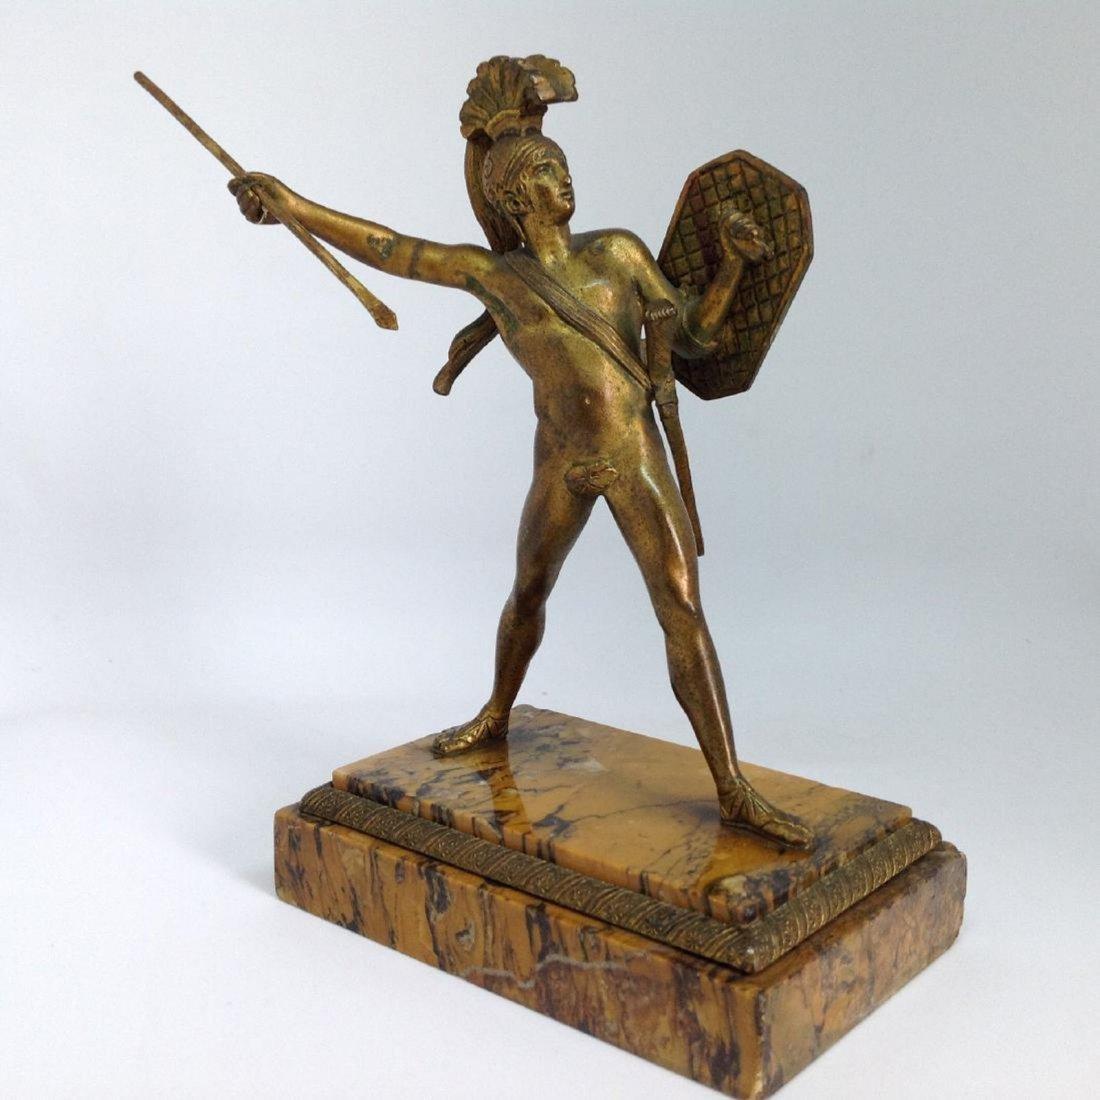 Antique Roman gilt bronze figure of a Centurion, c1820